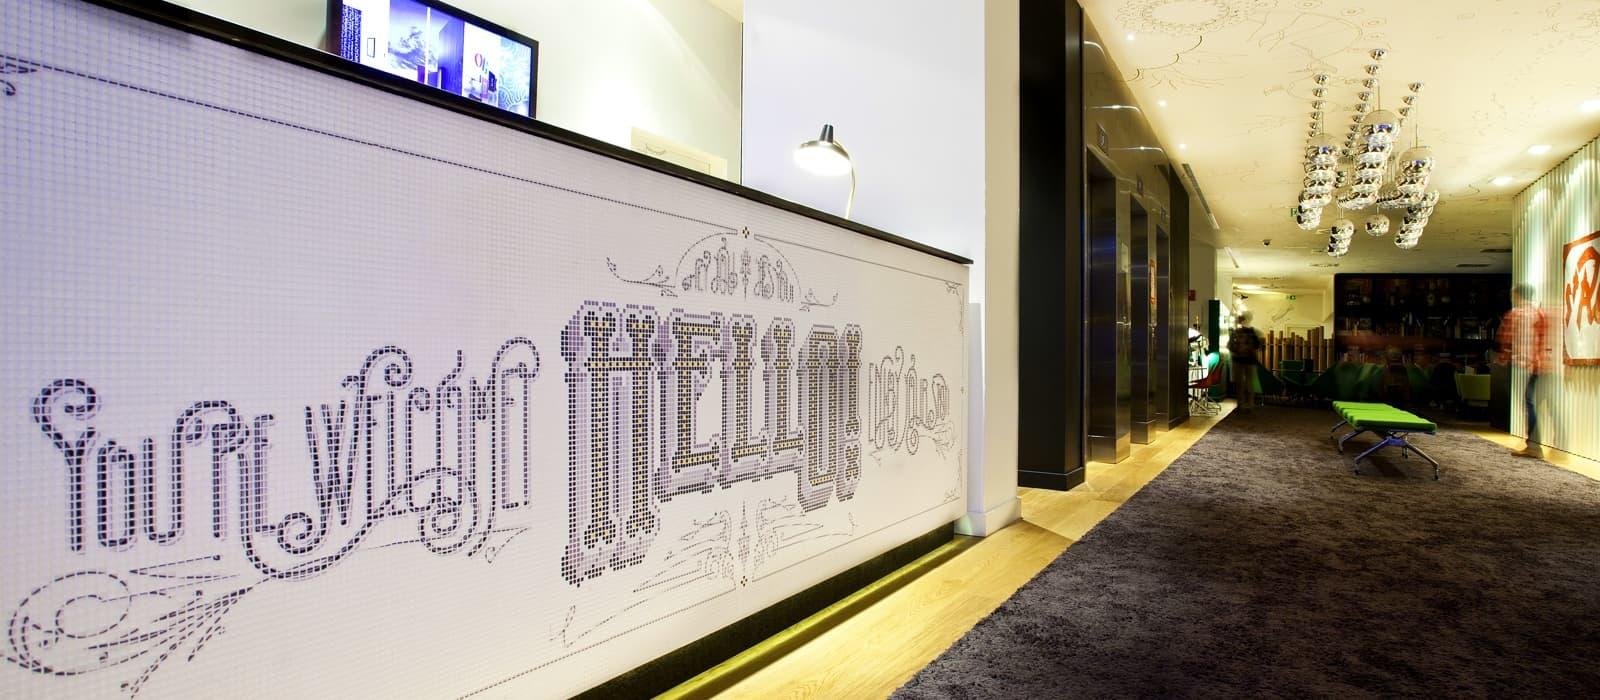 Hotel Barcelona Bit - Vincci Hoteles